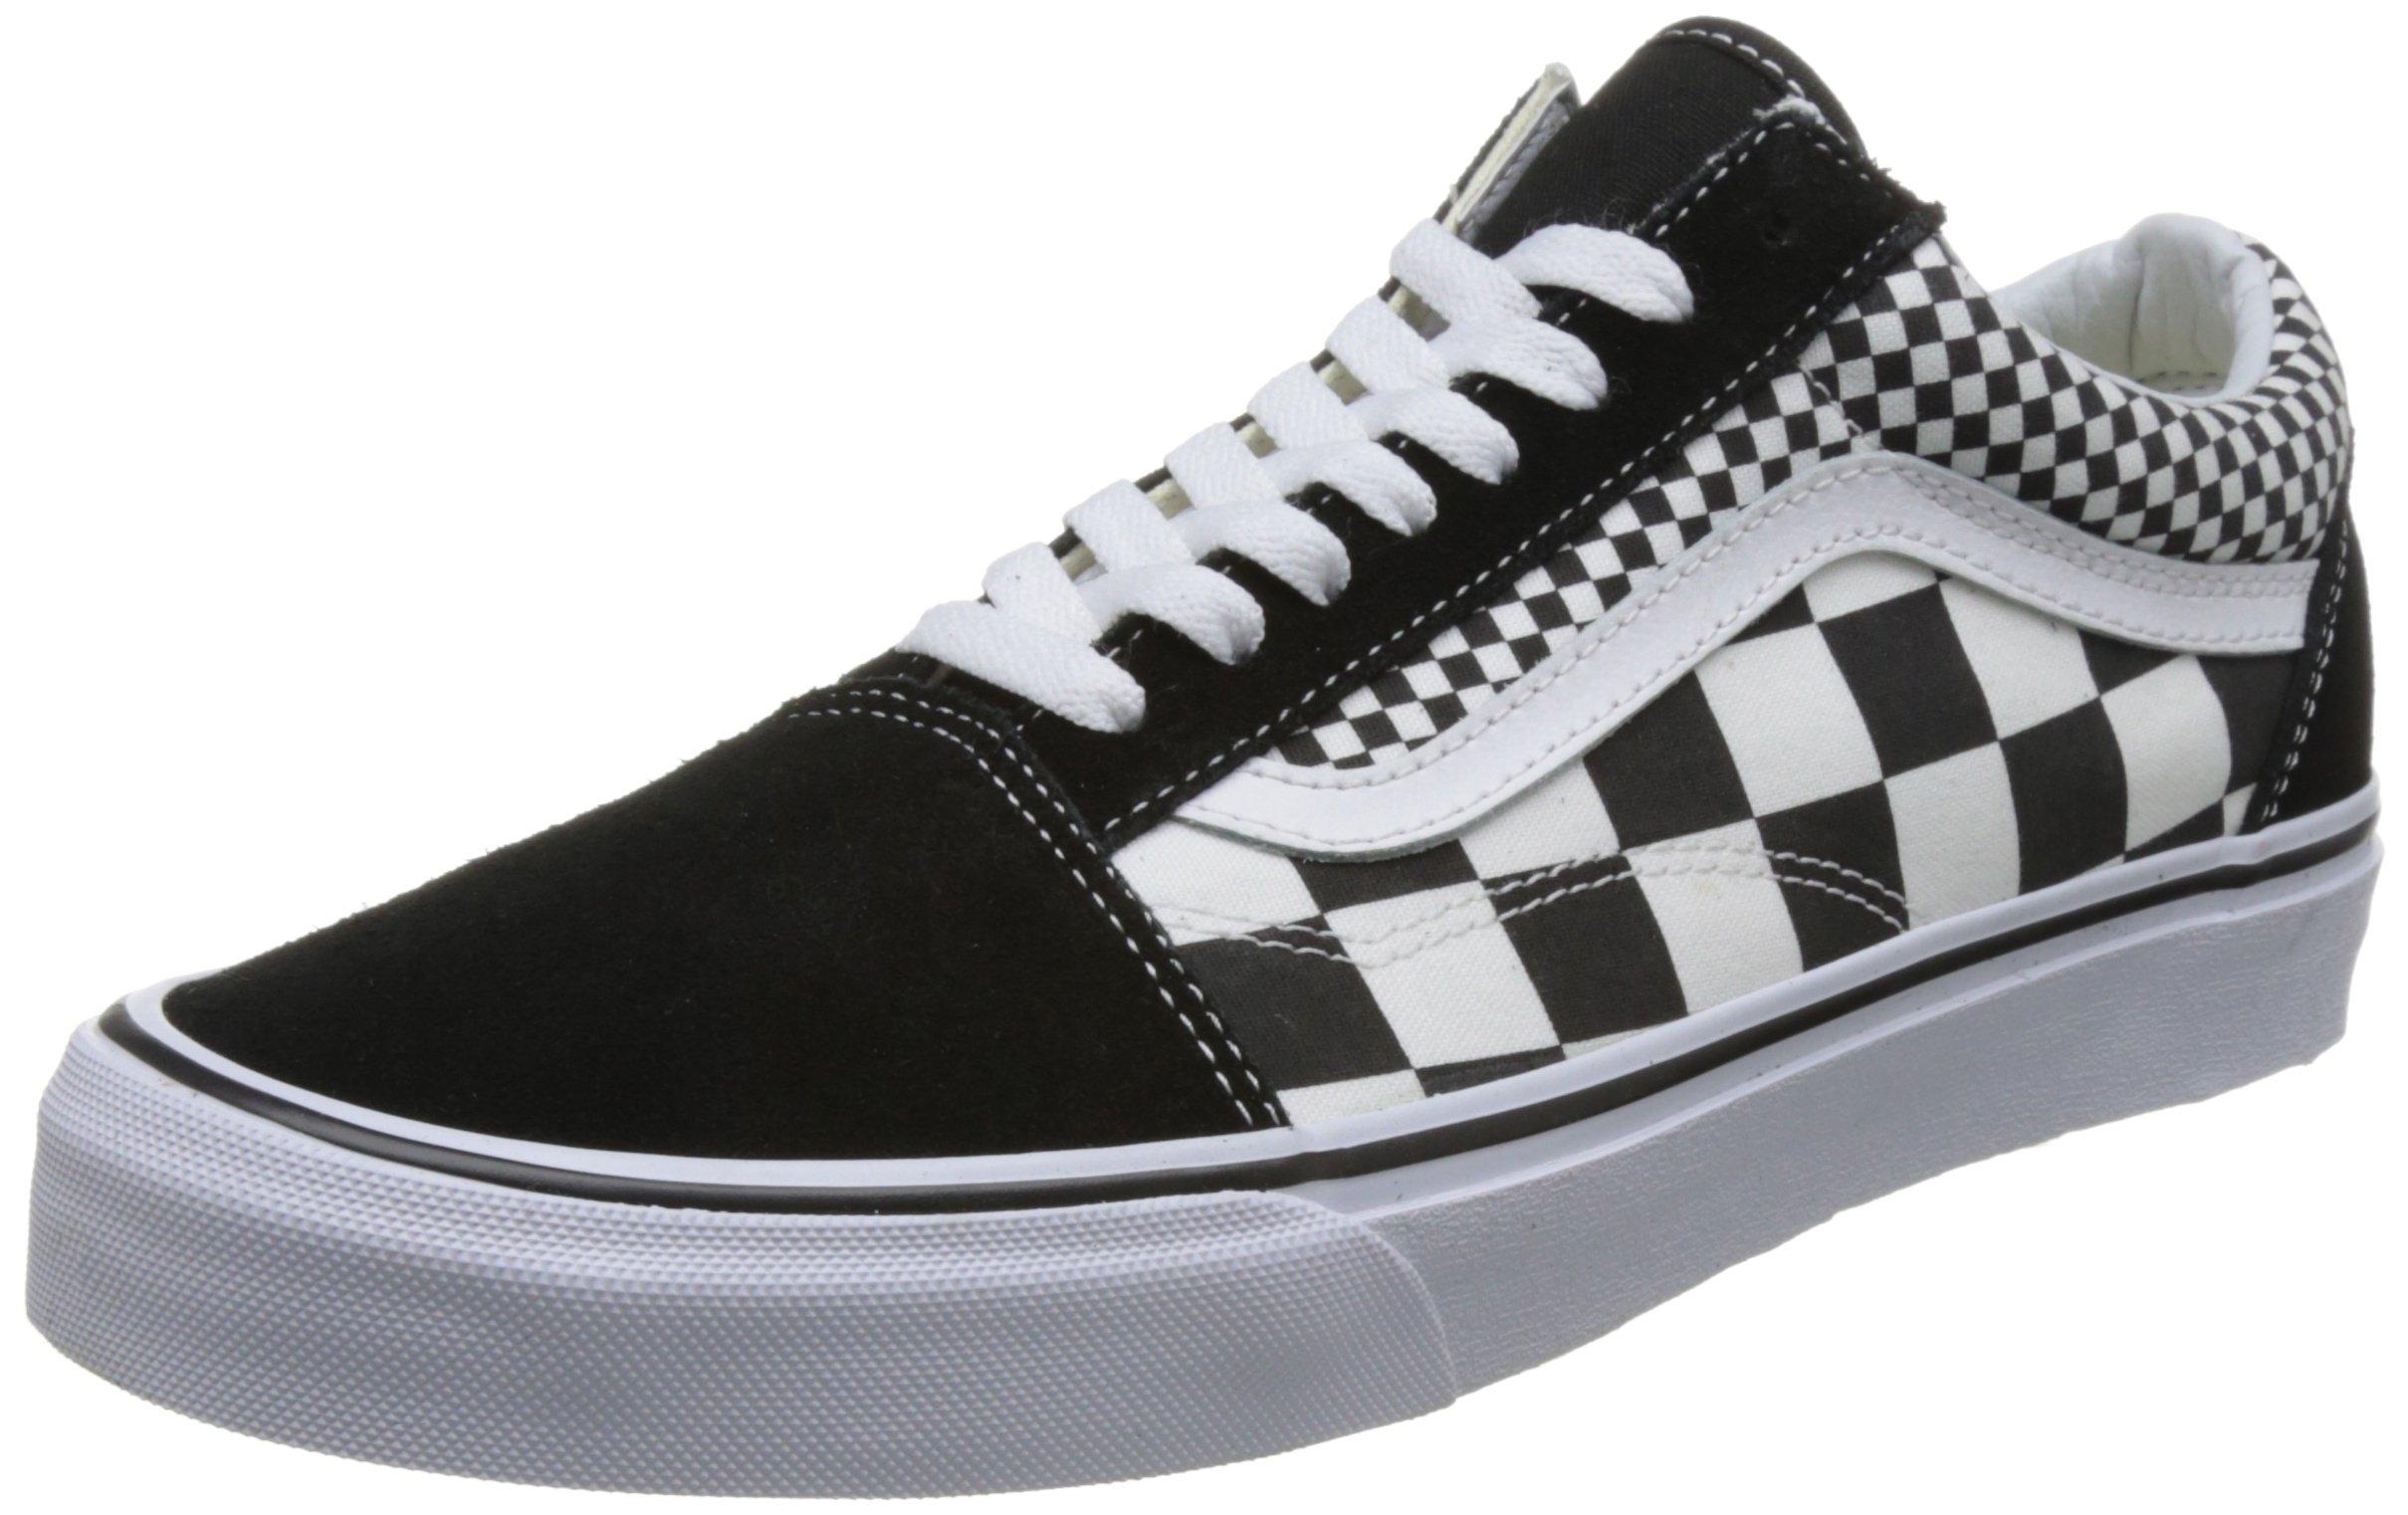 5074689504352 Vans Unisex Adults' Old Skool Trainers, Black ((Mix Checker) Black/True  White Q9B), 11.5 US Womens/10 US Men